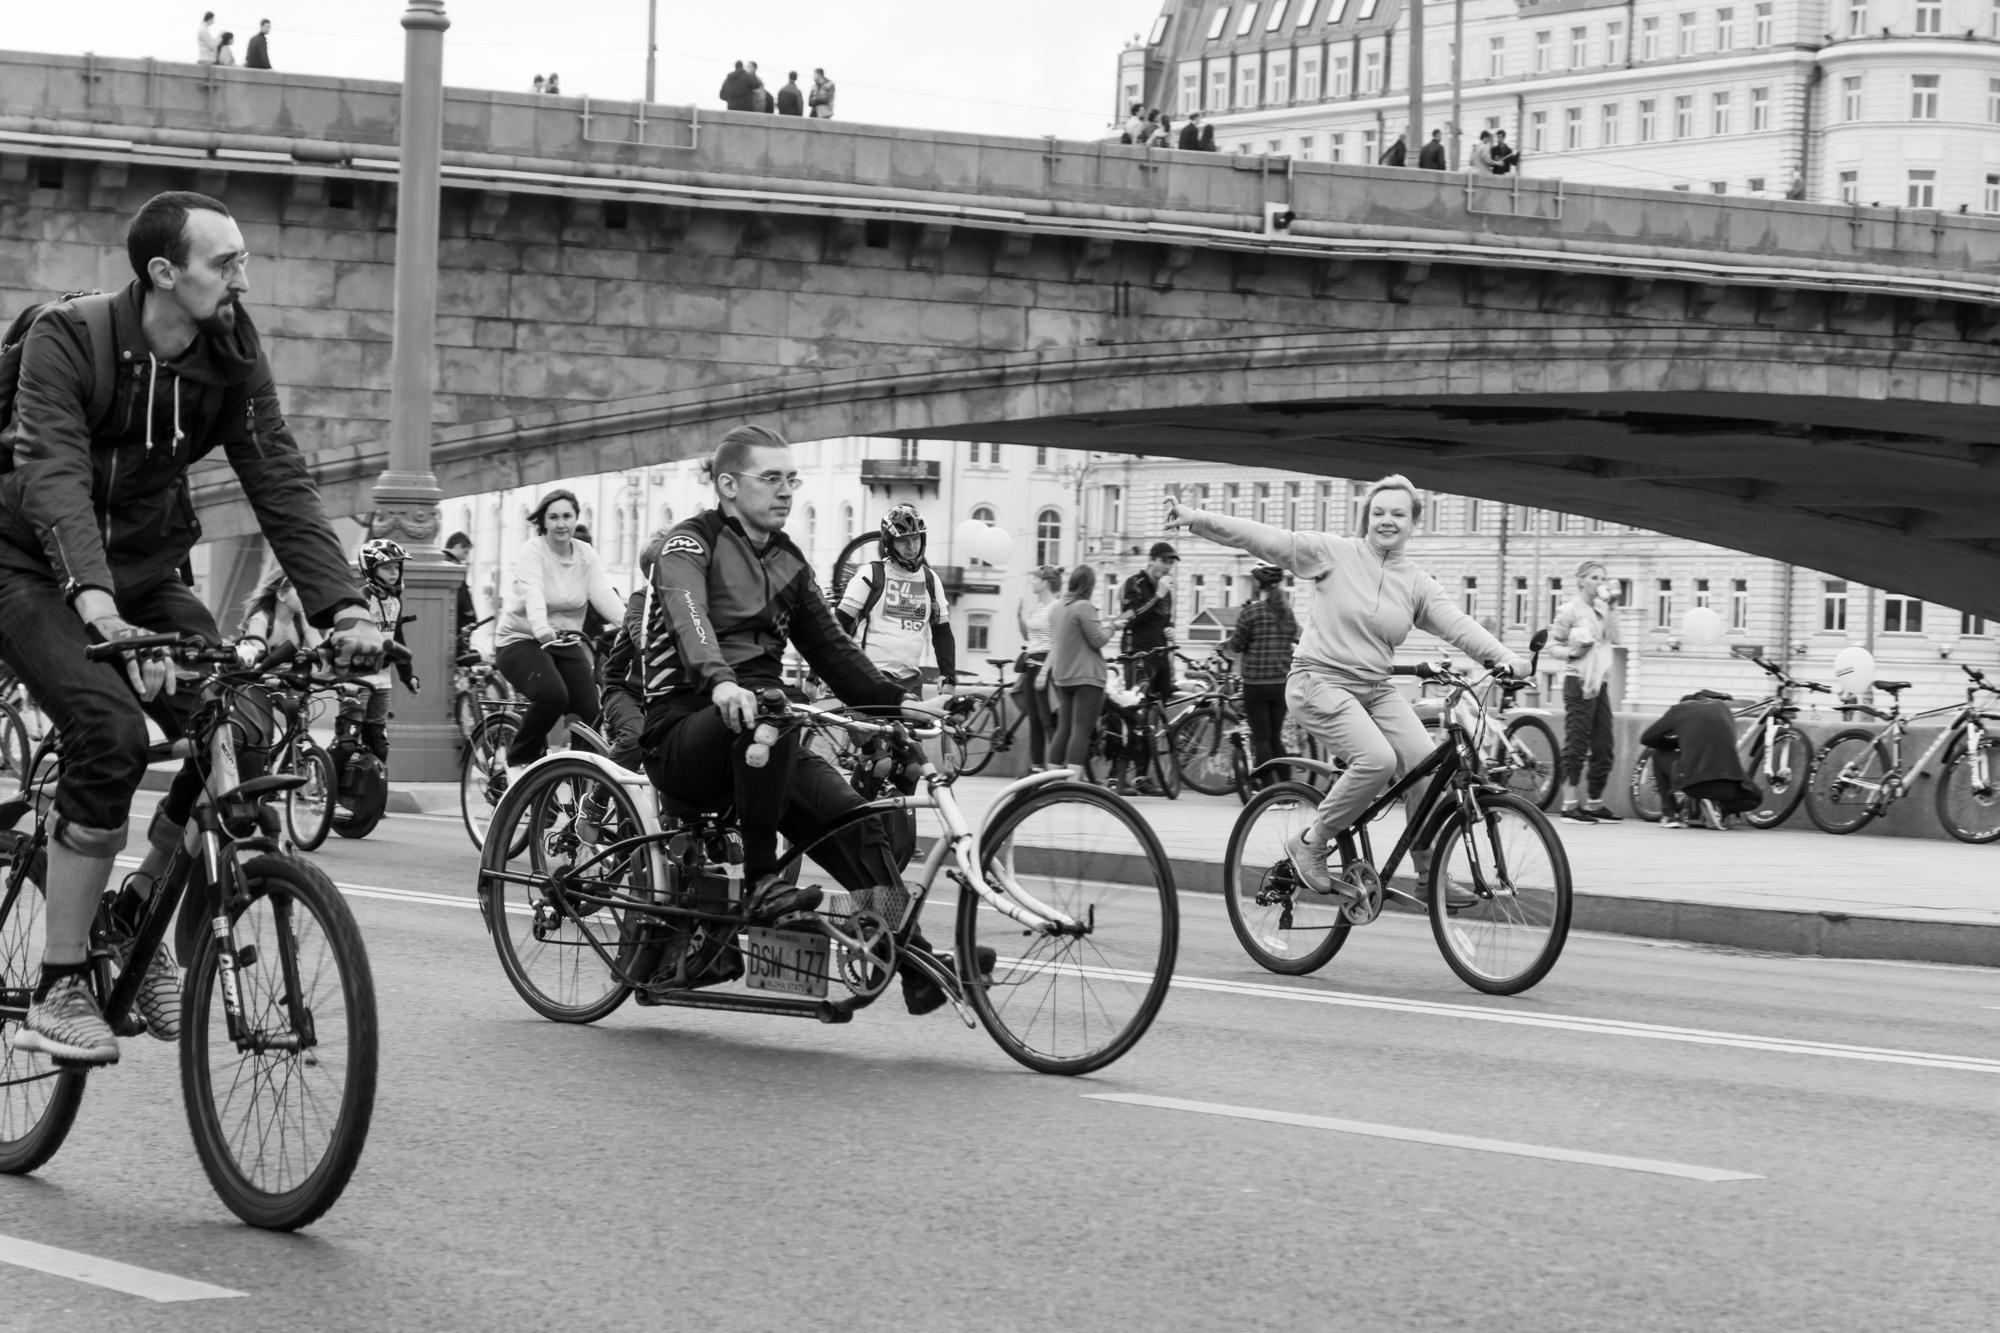 Москва - велопарад 17 сентября 2017